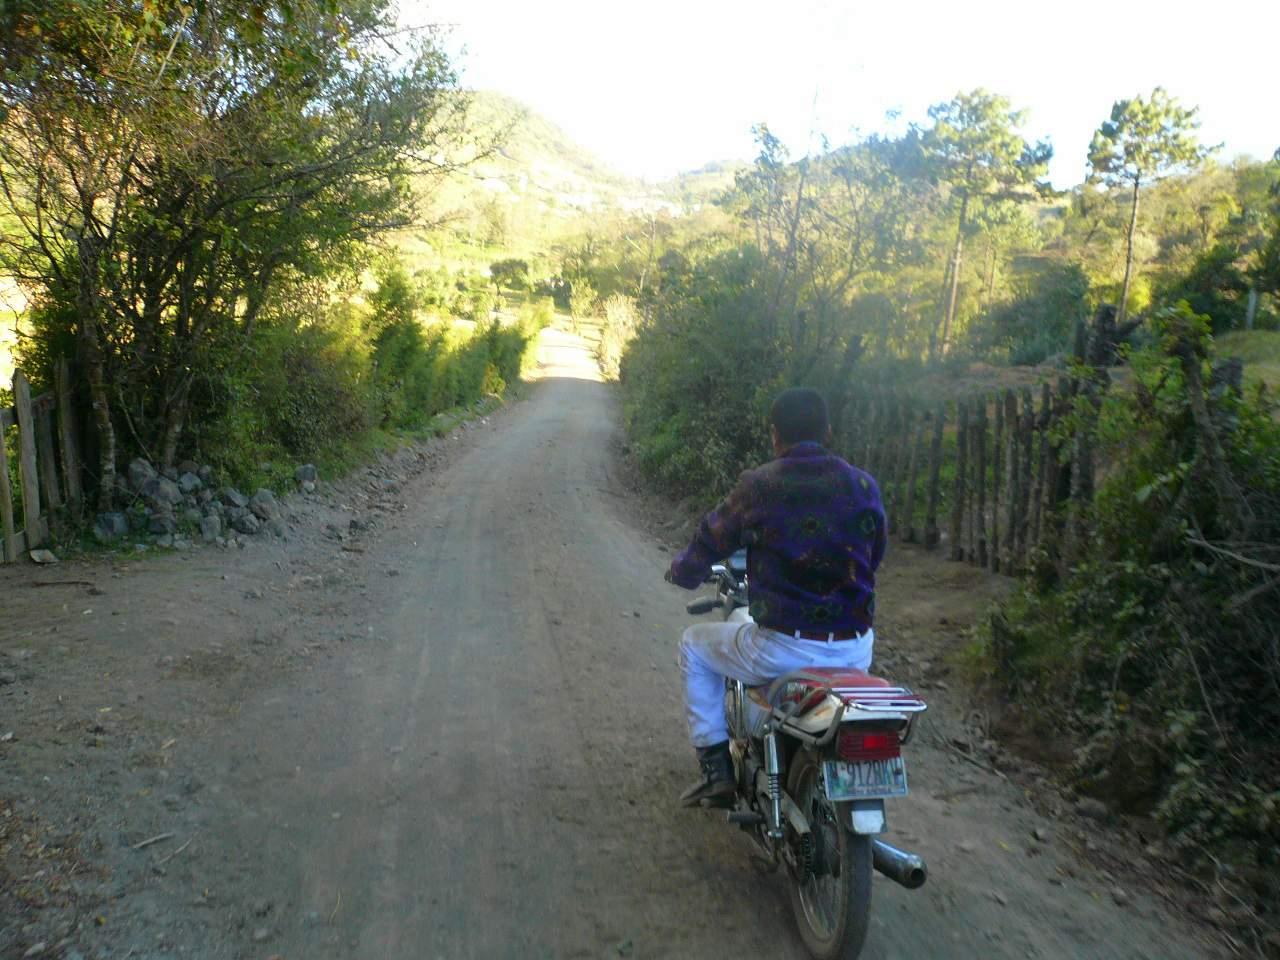 Carlos on his Suzuki motorbike.